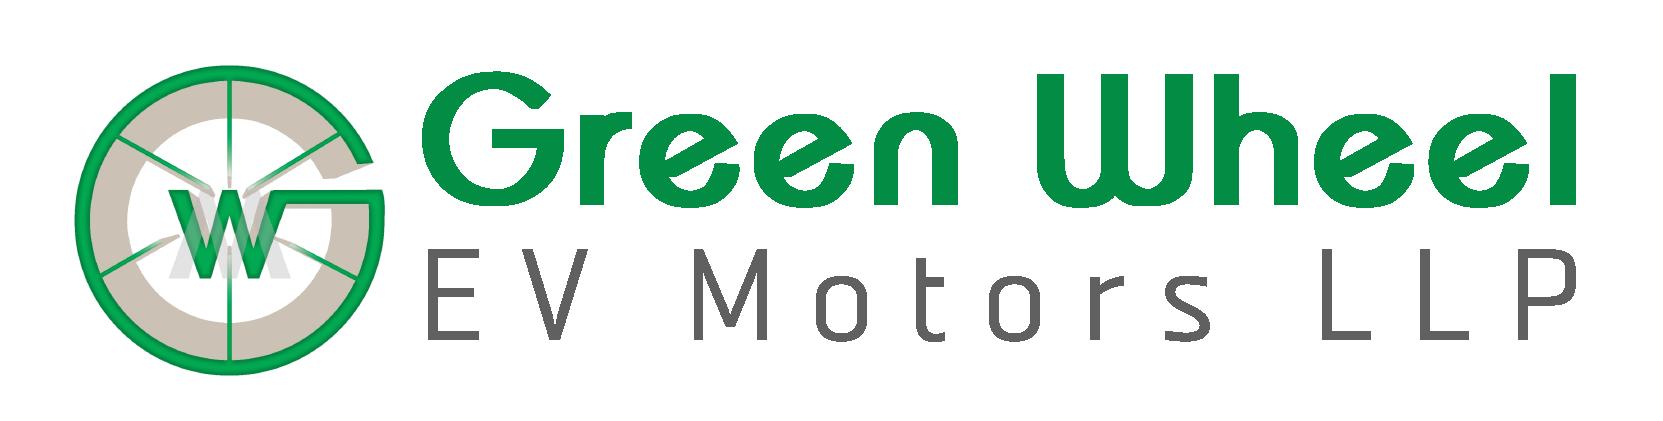 Electric Bike Price in Chennai | Hero Electric Dealer in Chennai